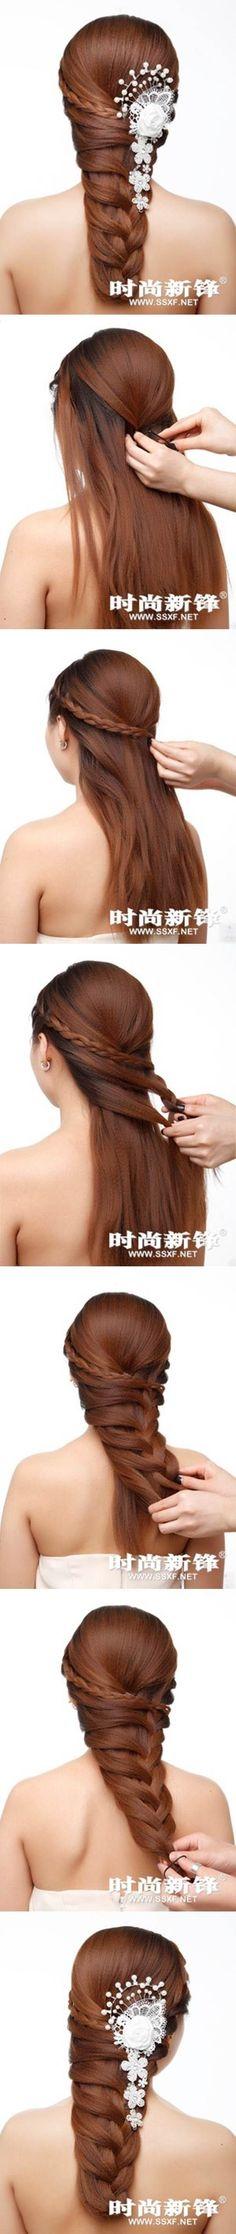 DIY Asymmetrical Braided Hairstyle | iCreativeIdeas.com LIKE Us on Facebook ==> https://www.facebook.com/icreativeideas